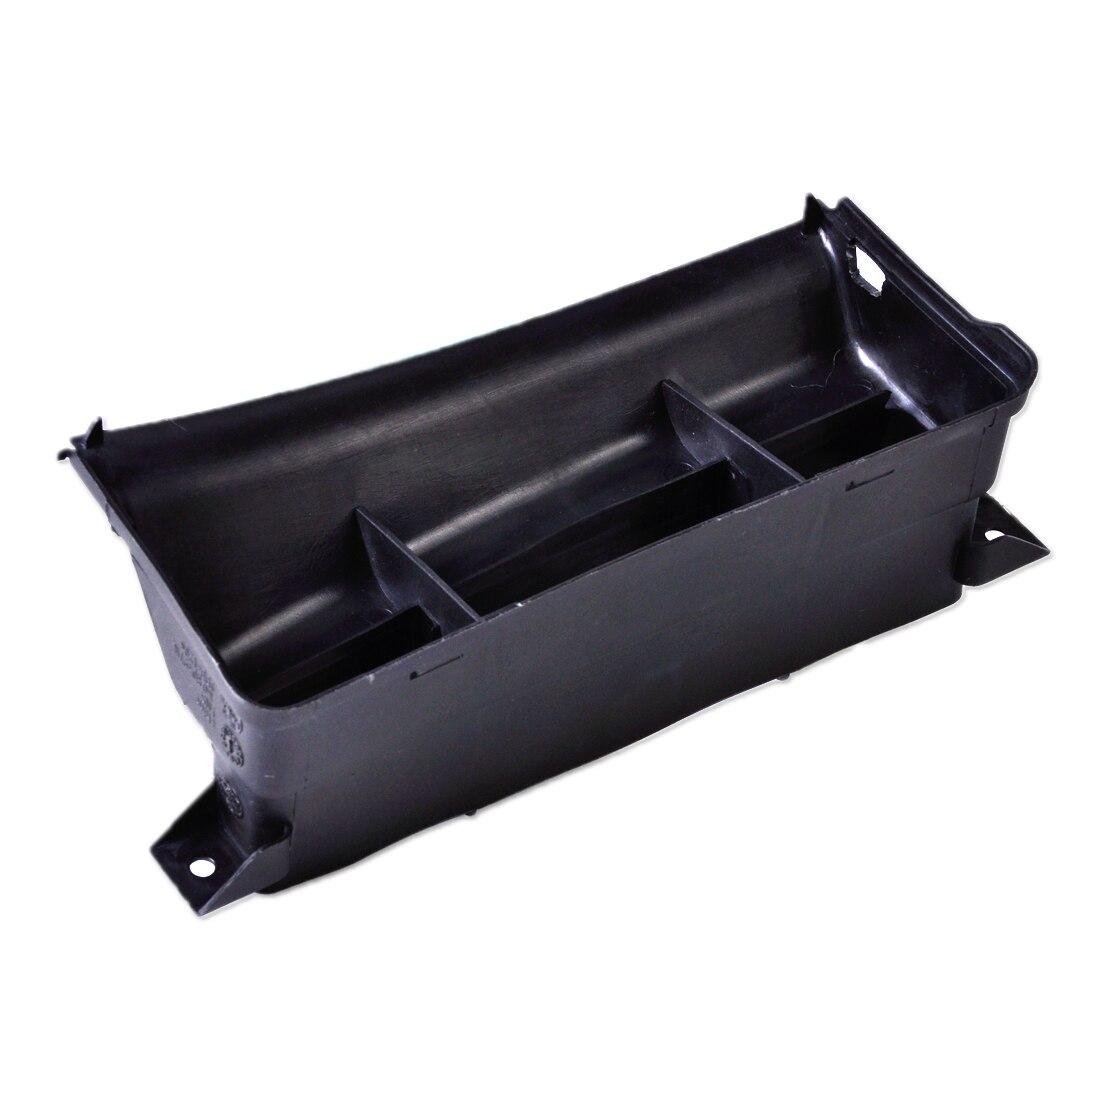 Beler 1Pc  Black Air Intake Guide Inlet Duct Fit For VW Volkswagen Golf Jetta Mk5 Mk6 2011 2012 2013 1K0805971C 1K0805971